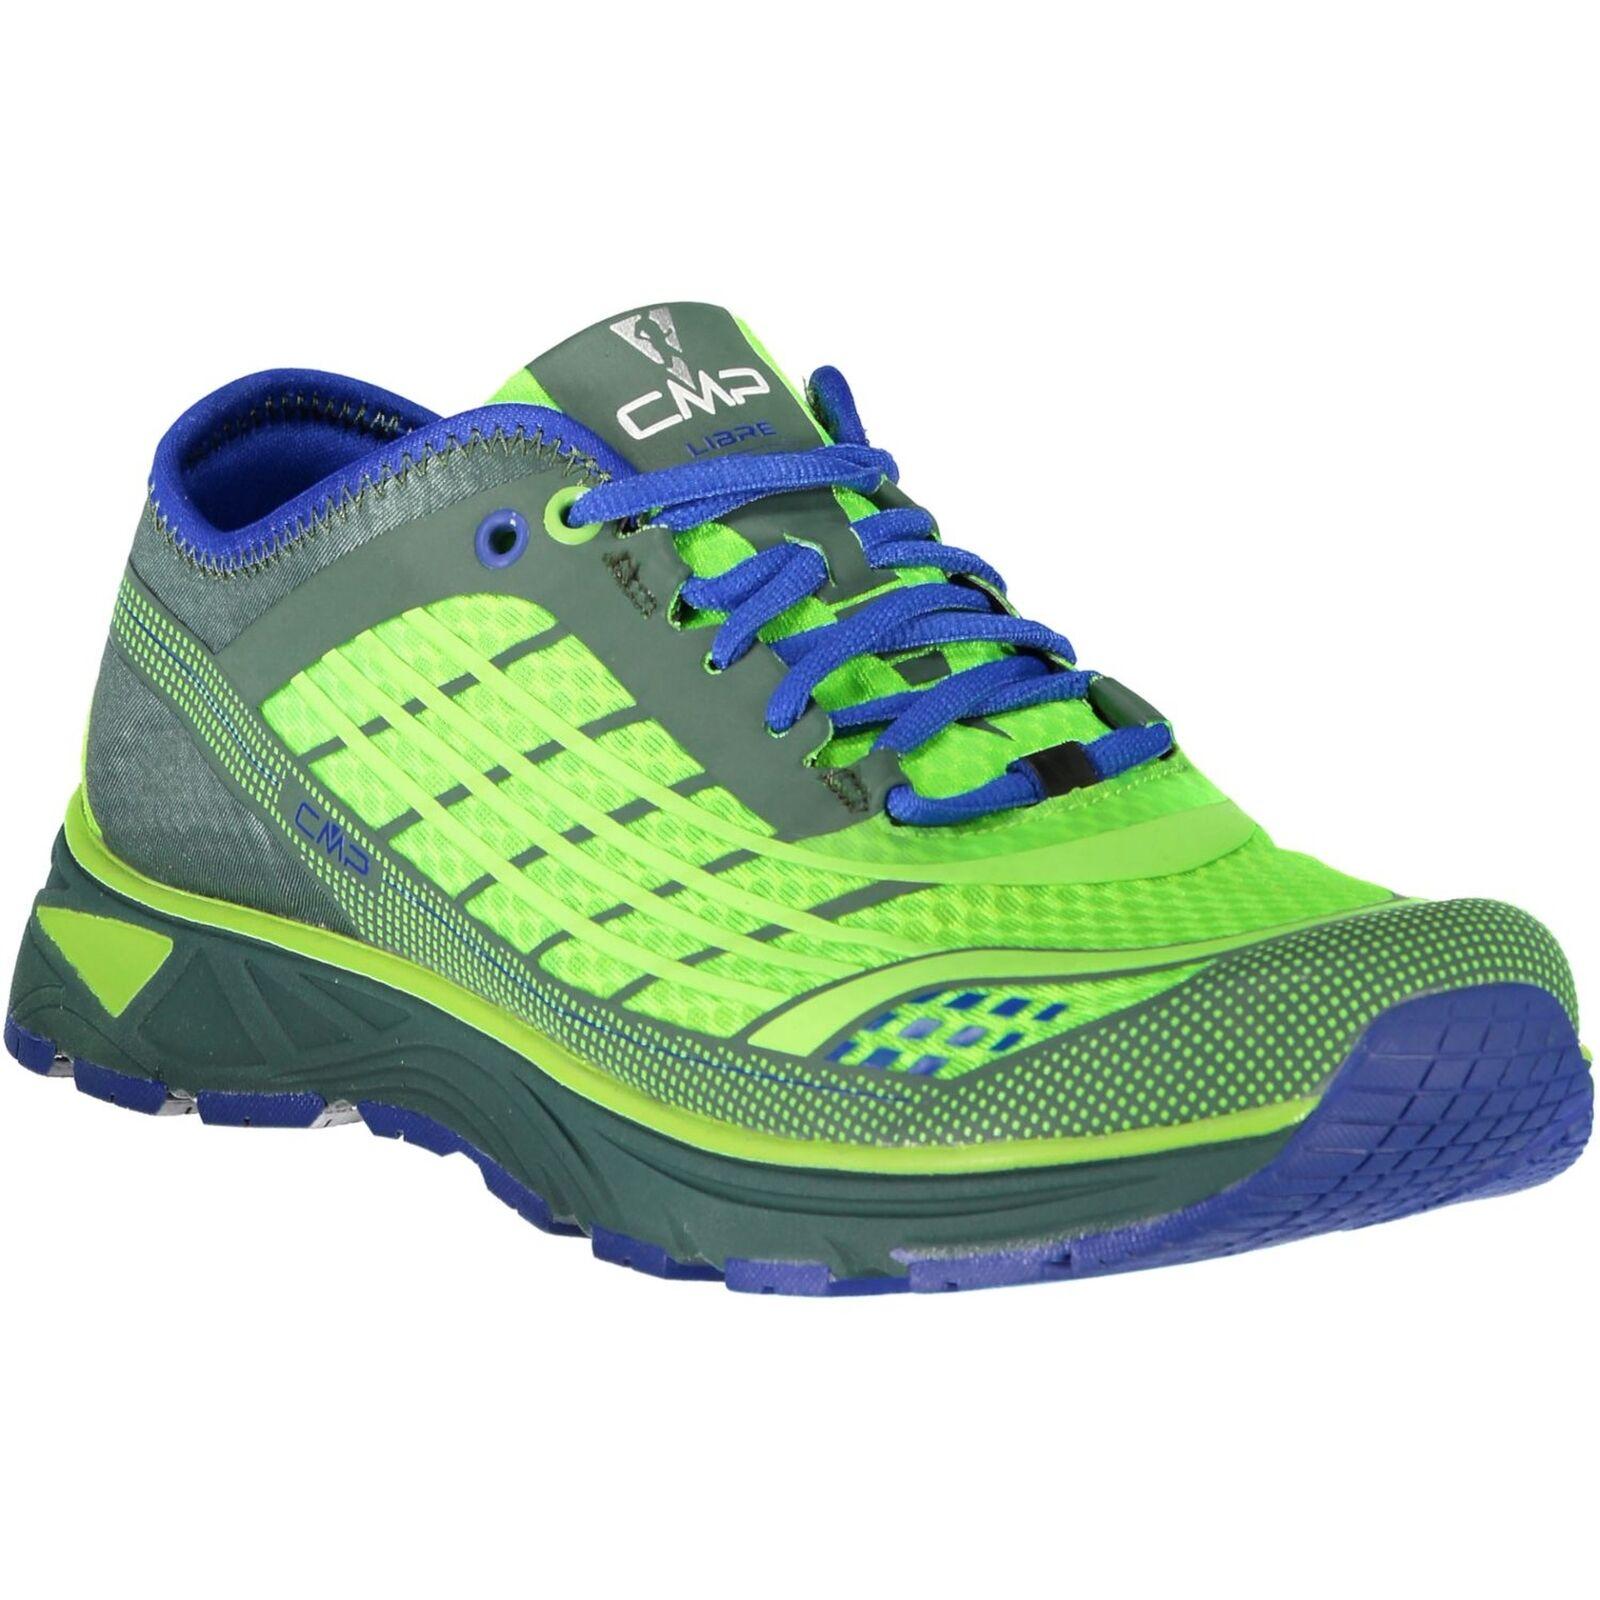 CMP Running Sports shoes Libre Running shoes Green Plain Colour Mesh